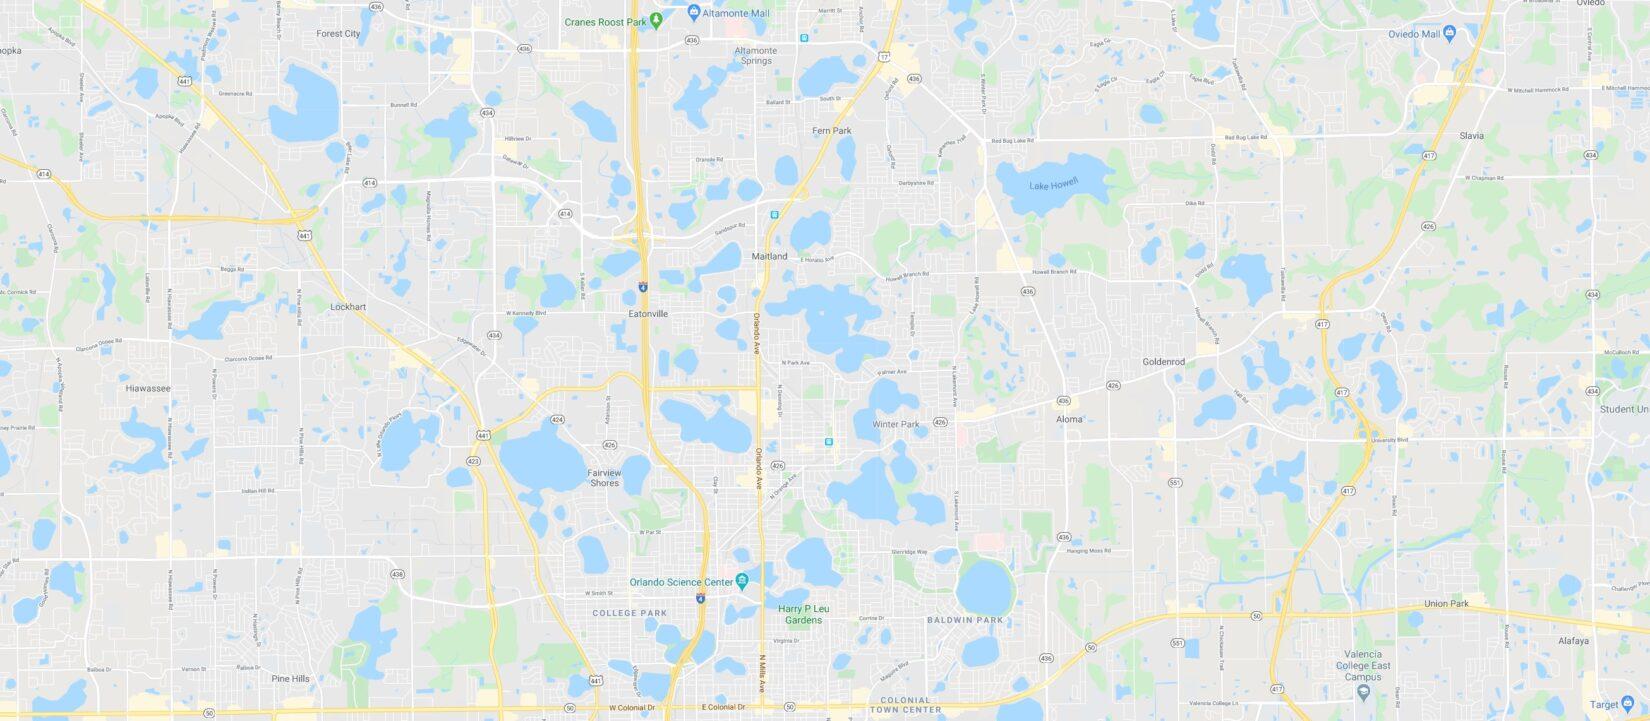 Google Maps of the Orlando/Maitland Area